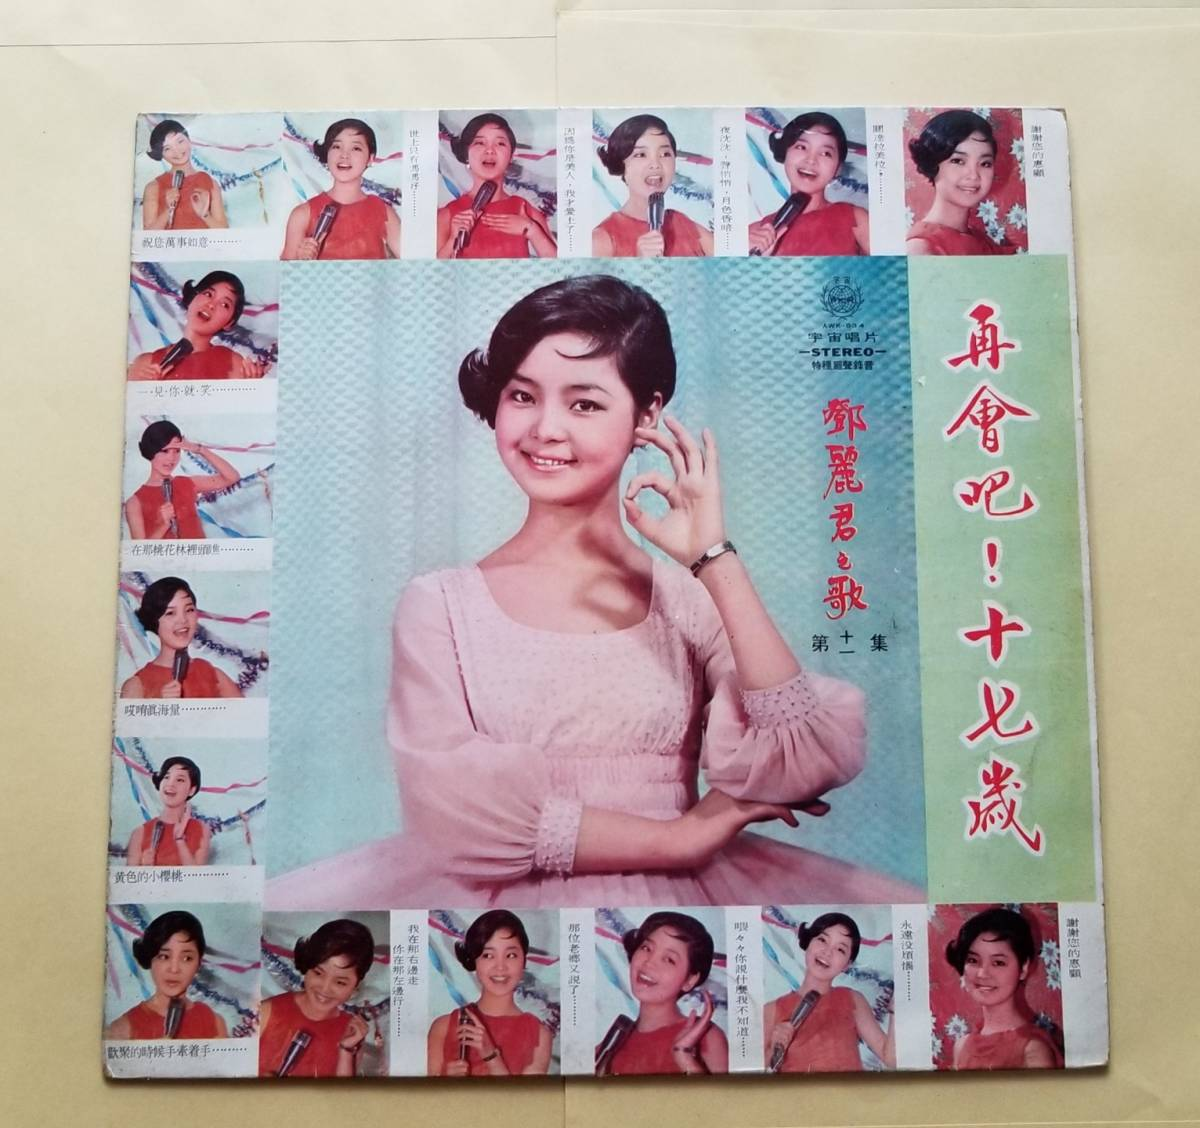 LP 鄧麗君之歌第十一集「再會!十七」 AWK-034 送料込